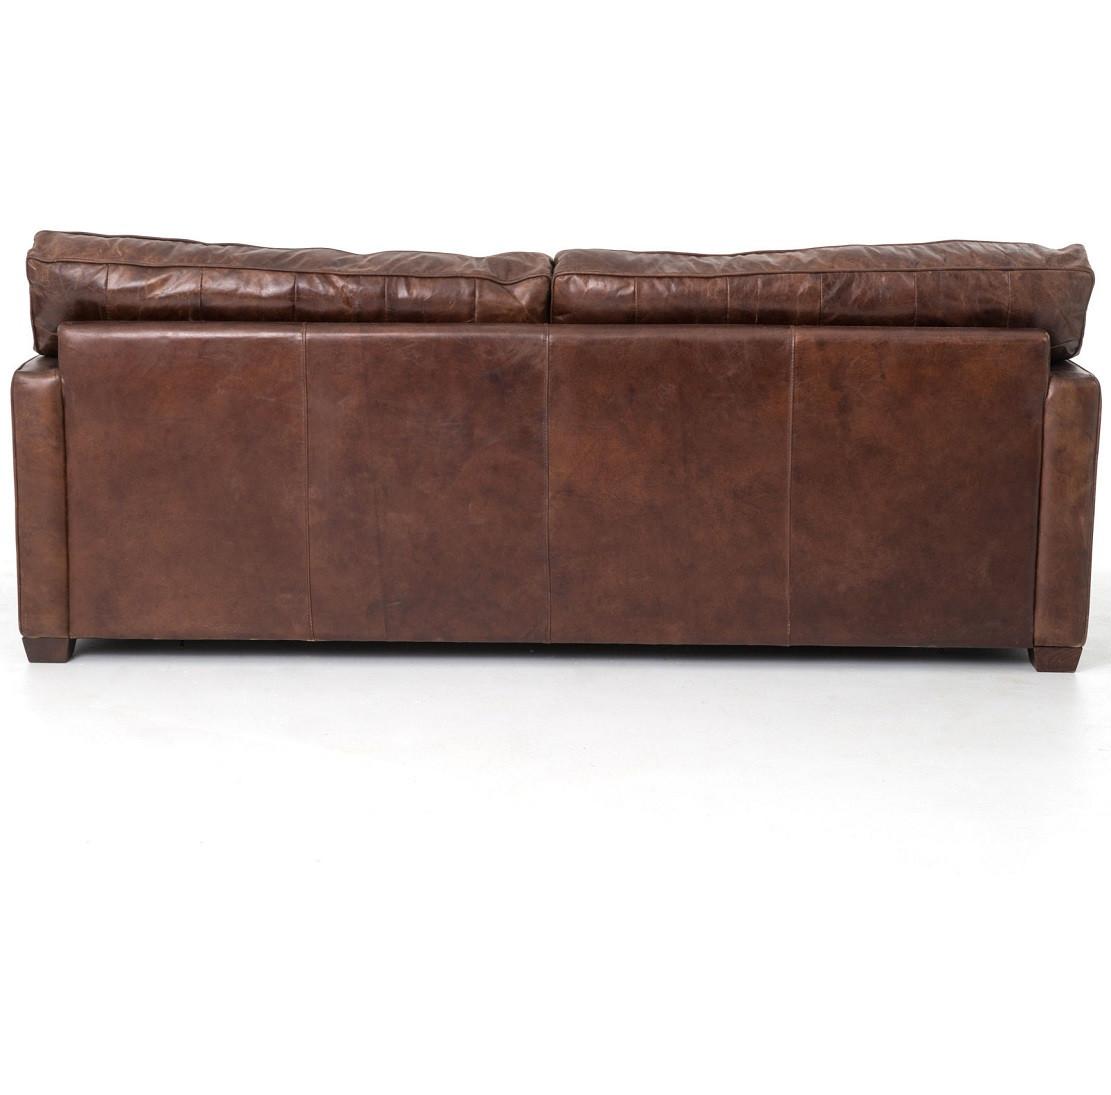 Cigar Leather Sofa Odelia Vintage Sofas